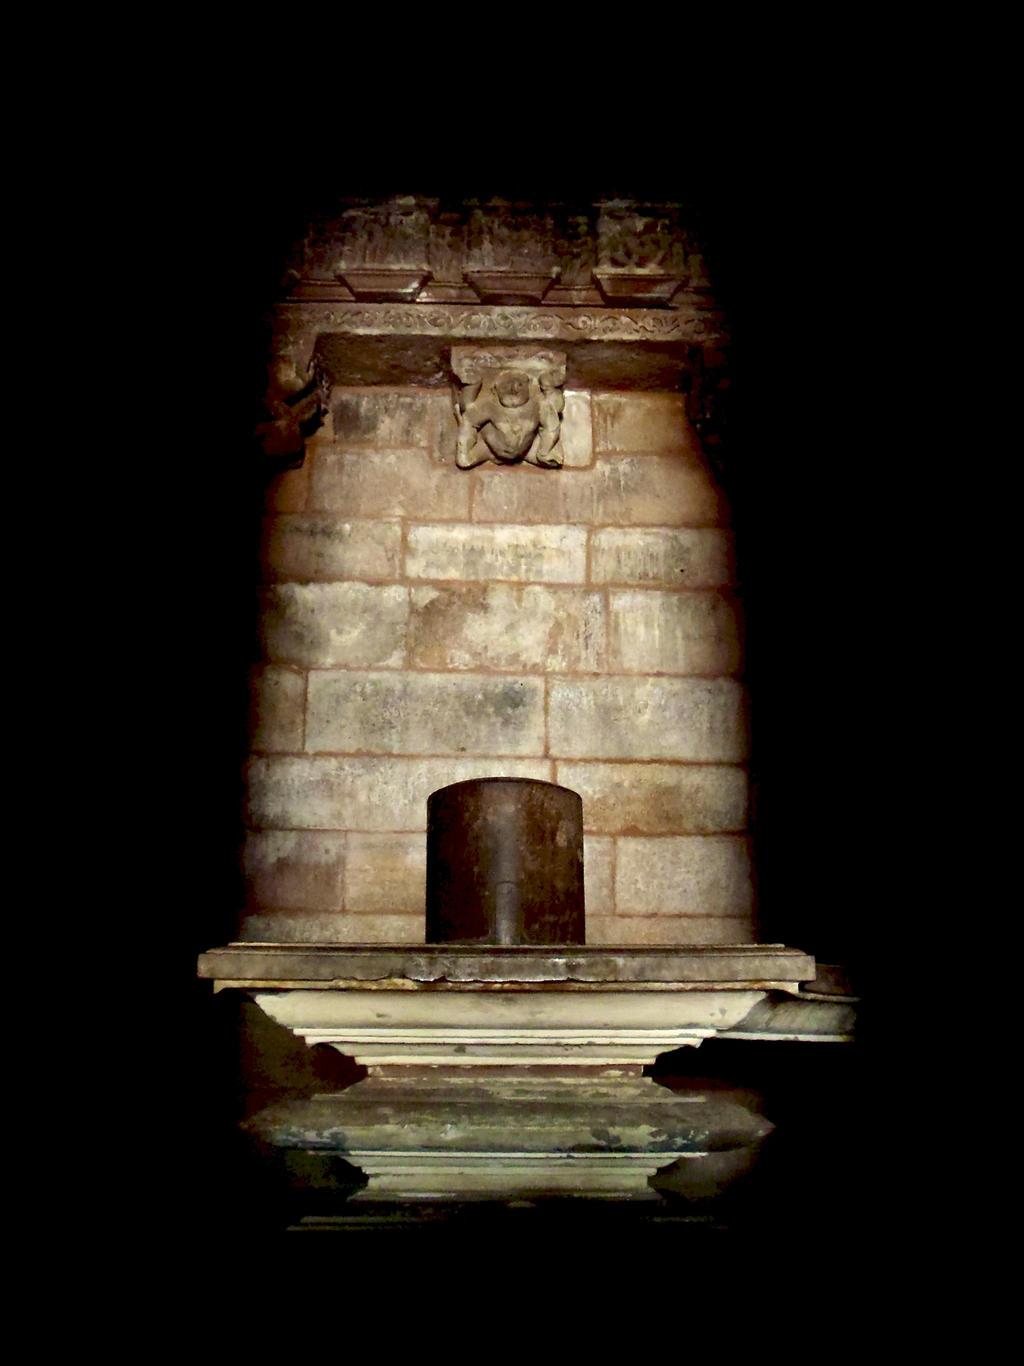 Lord Shiva Lingam Hd Wallpapers Free Download Vinnyoleo Vegetal